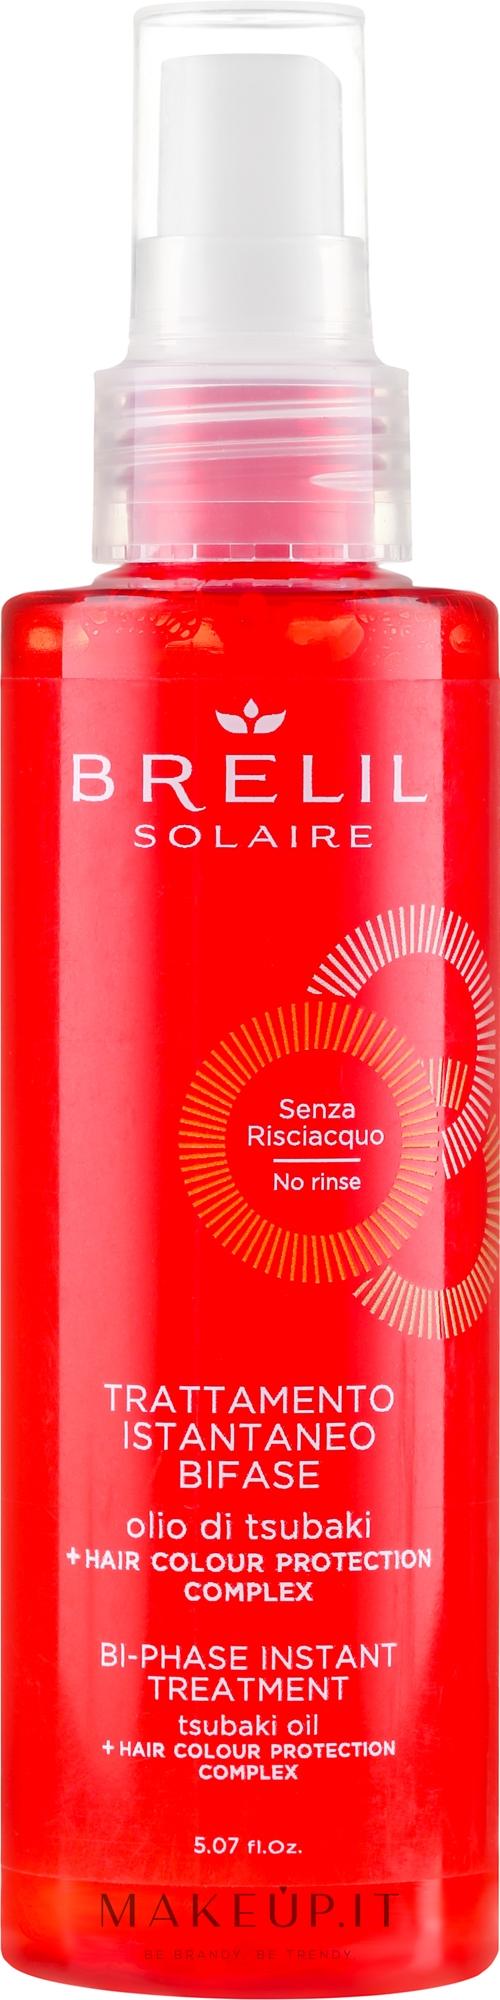 Balsamo bifase recupero istantaneo - Brelil Solaire Bi-Phase Instant Treatment — foto 150 ml